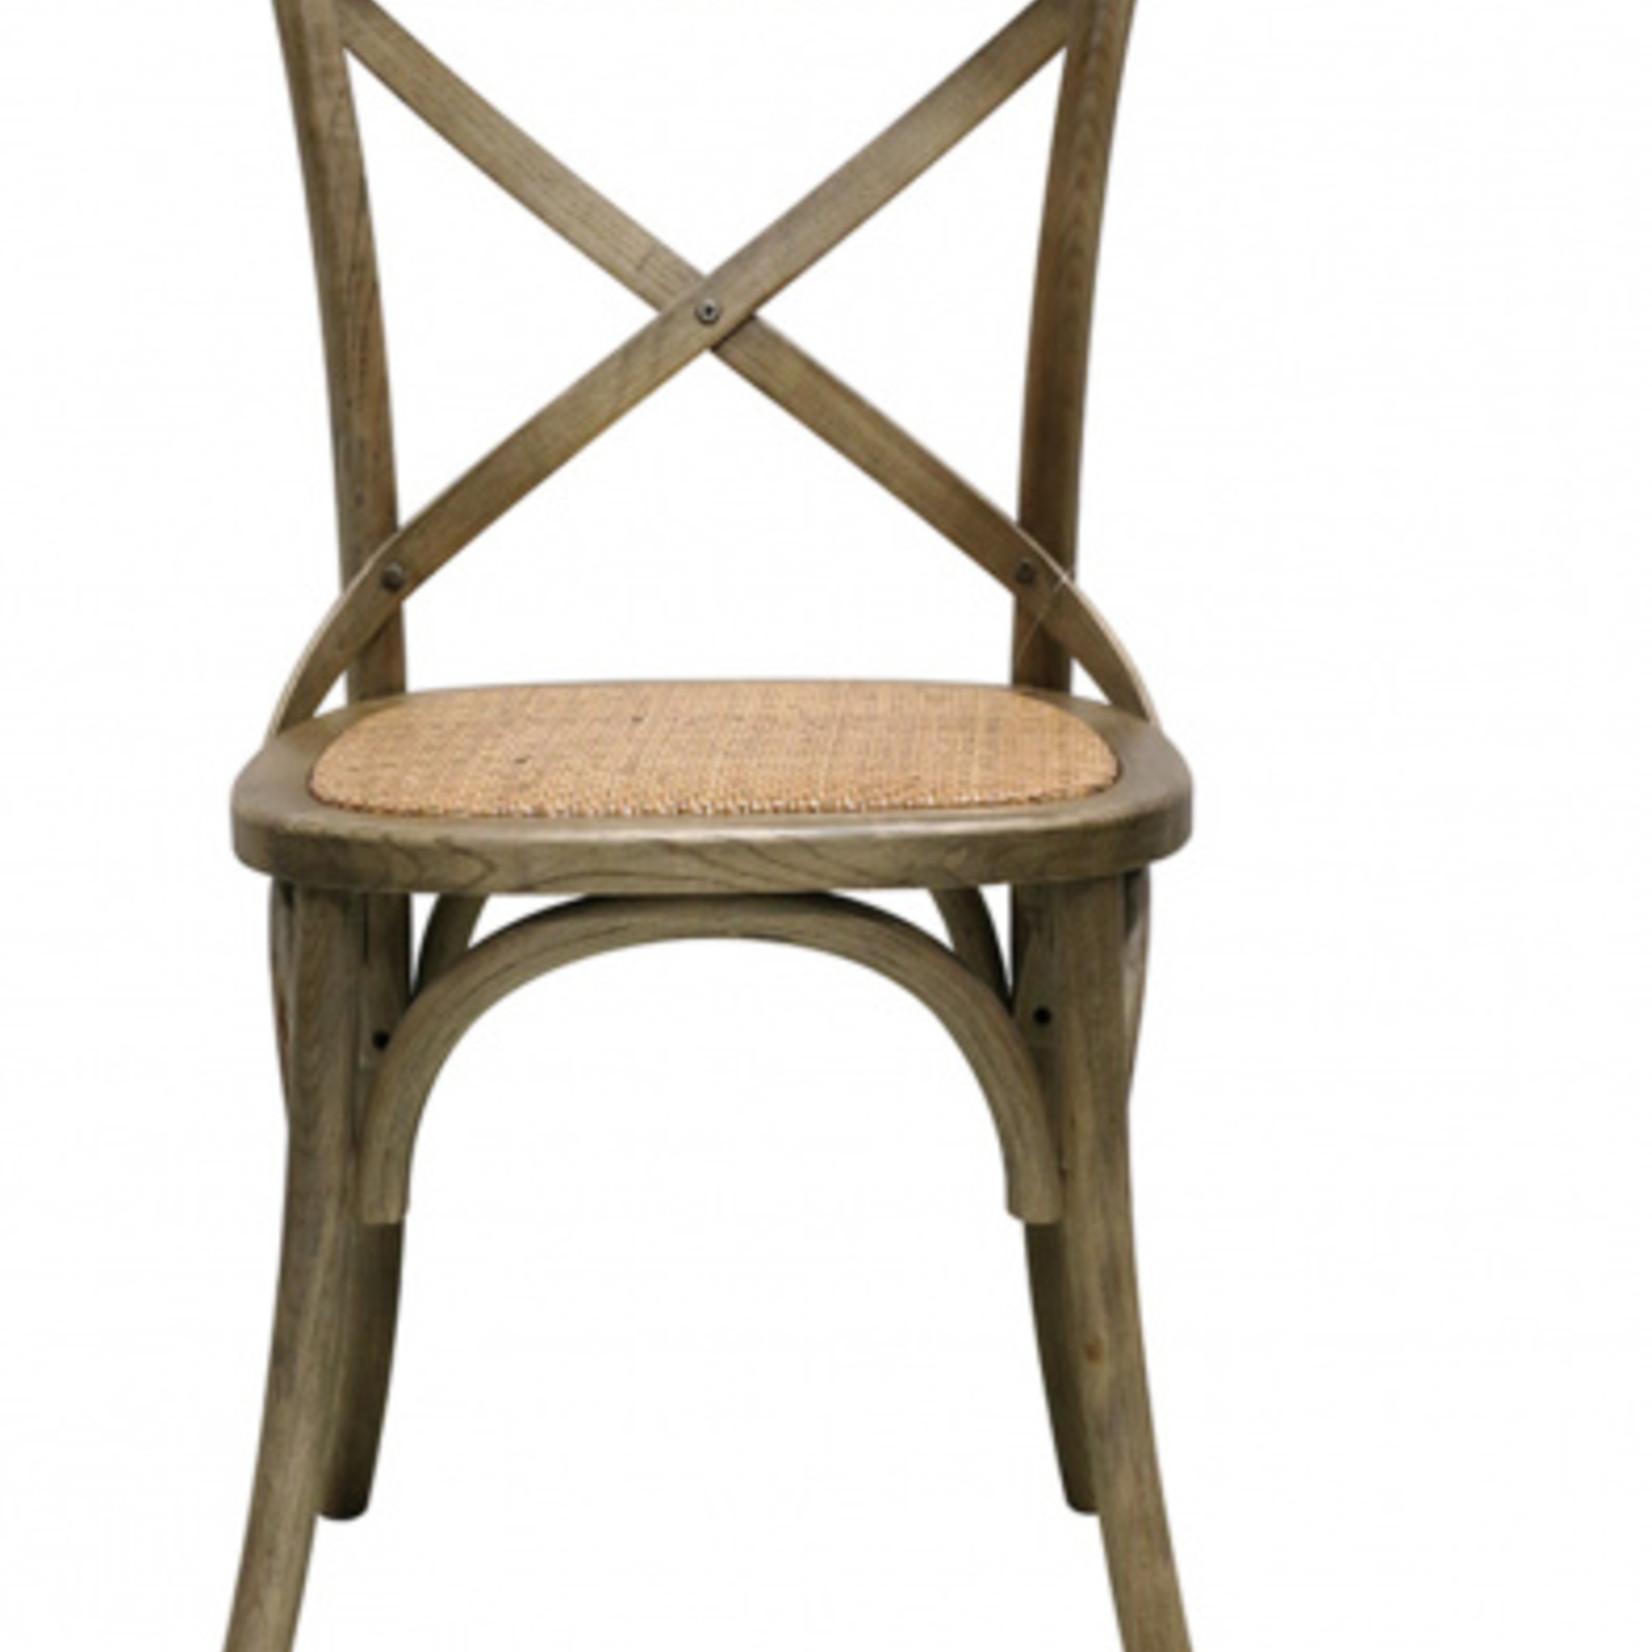 CC Interiors Vienna Elm Chair with Metal Cross Back